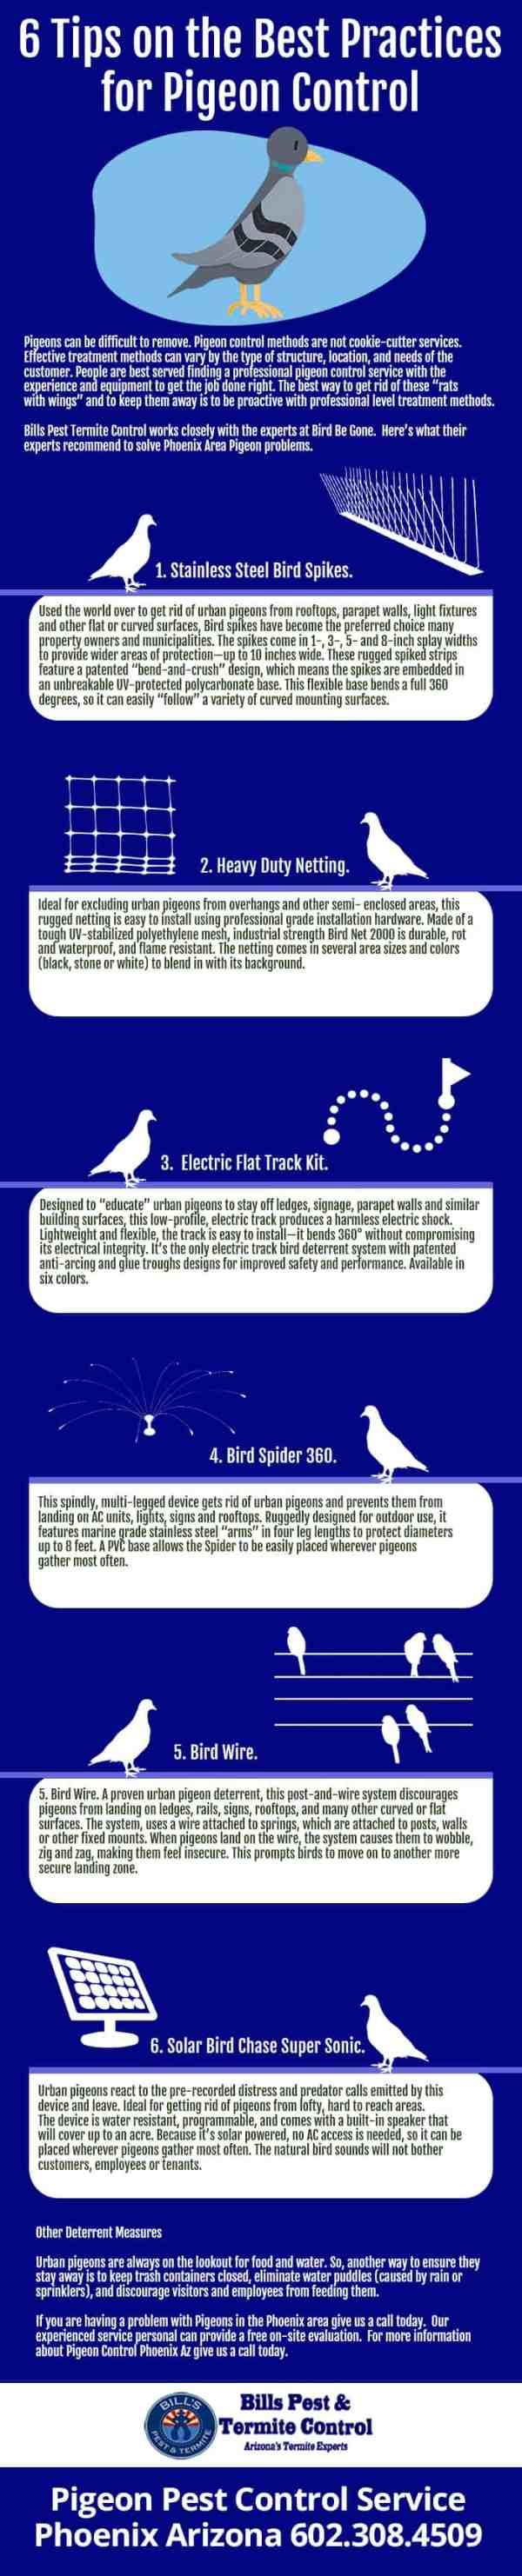 infographic-194-penguin-control